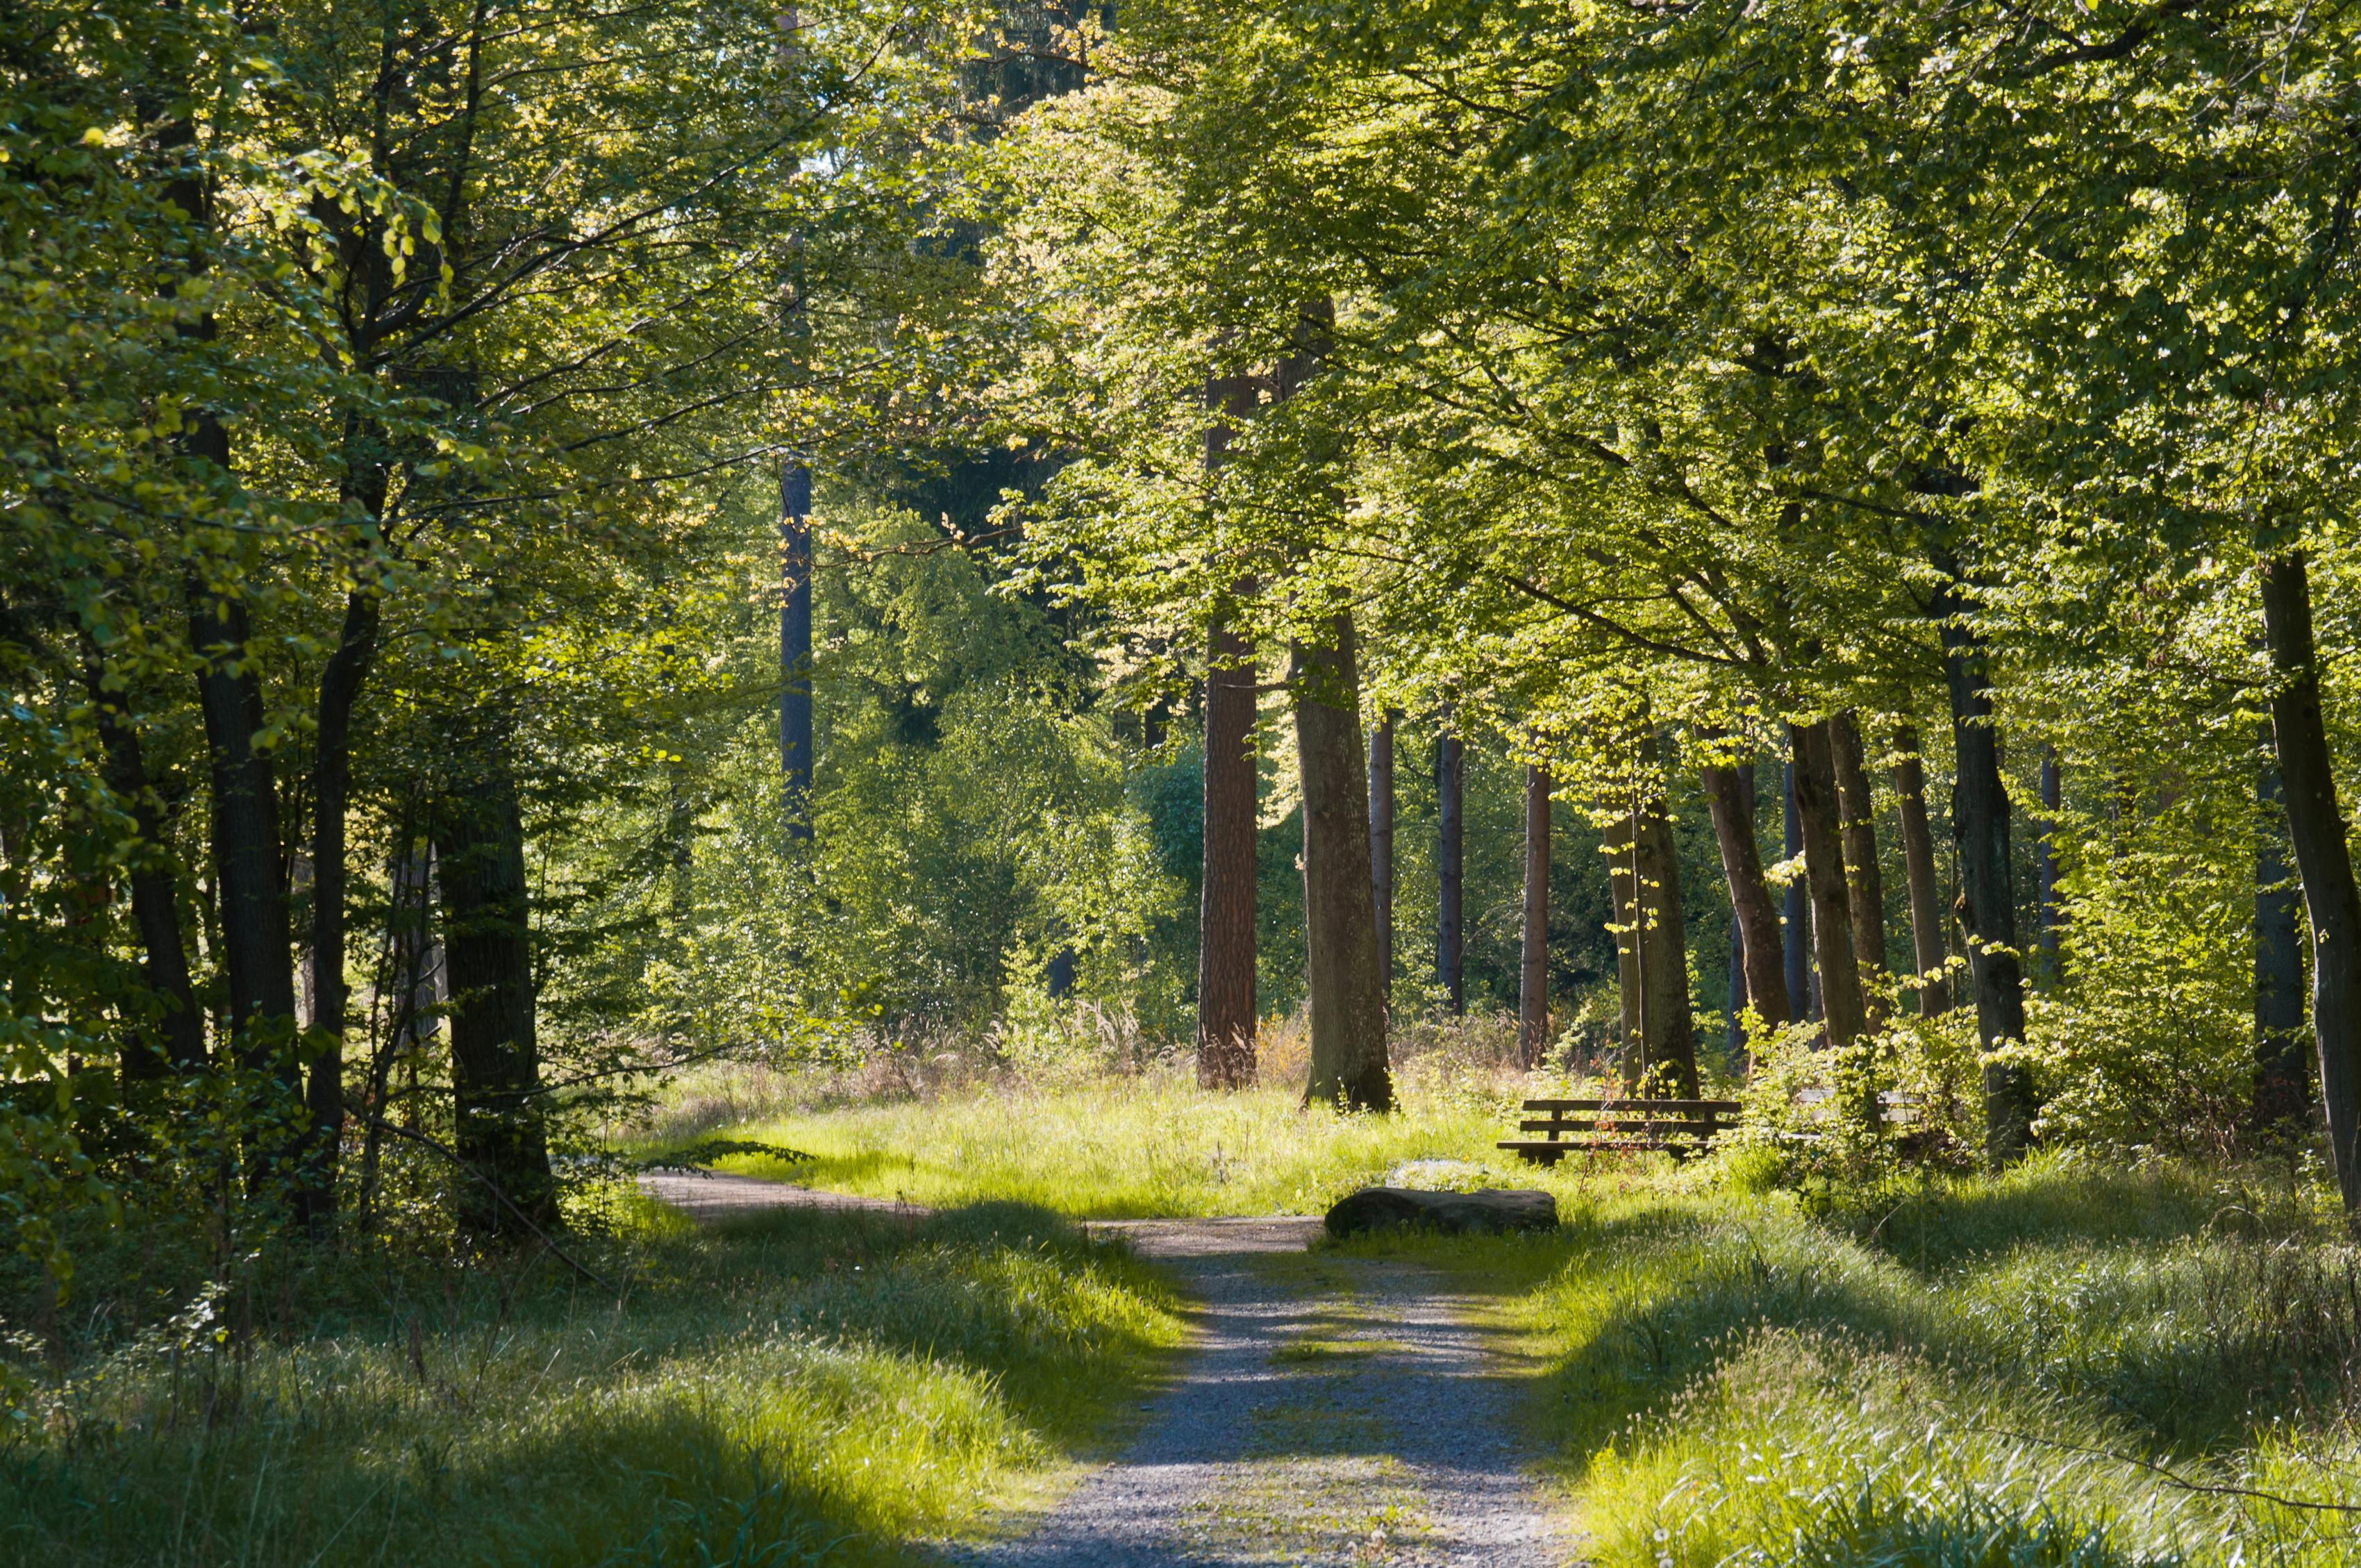 Rotwildpark bei stuttgart wikiwand for Who is perfect stuttgart